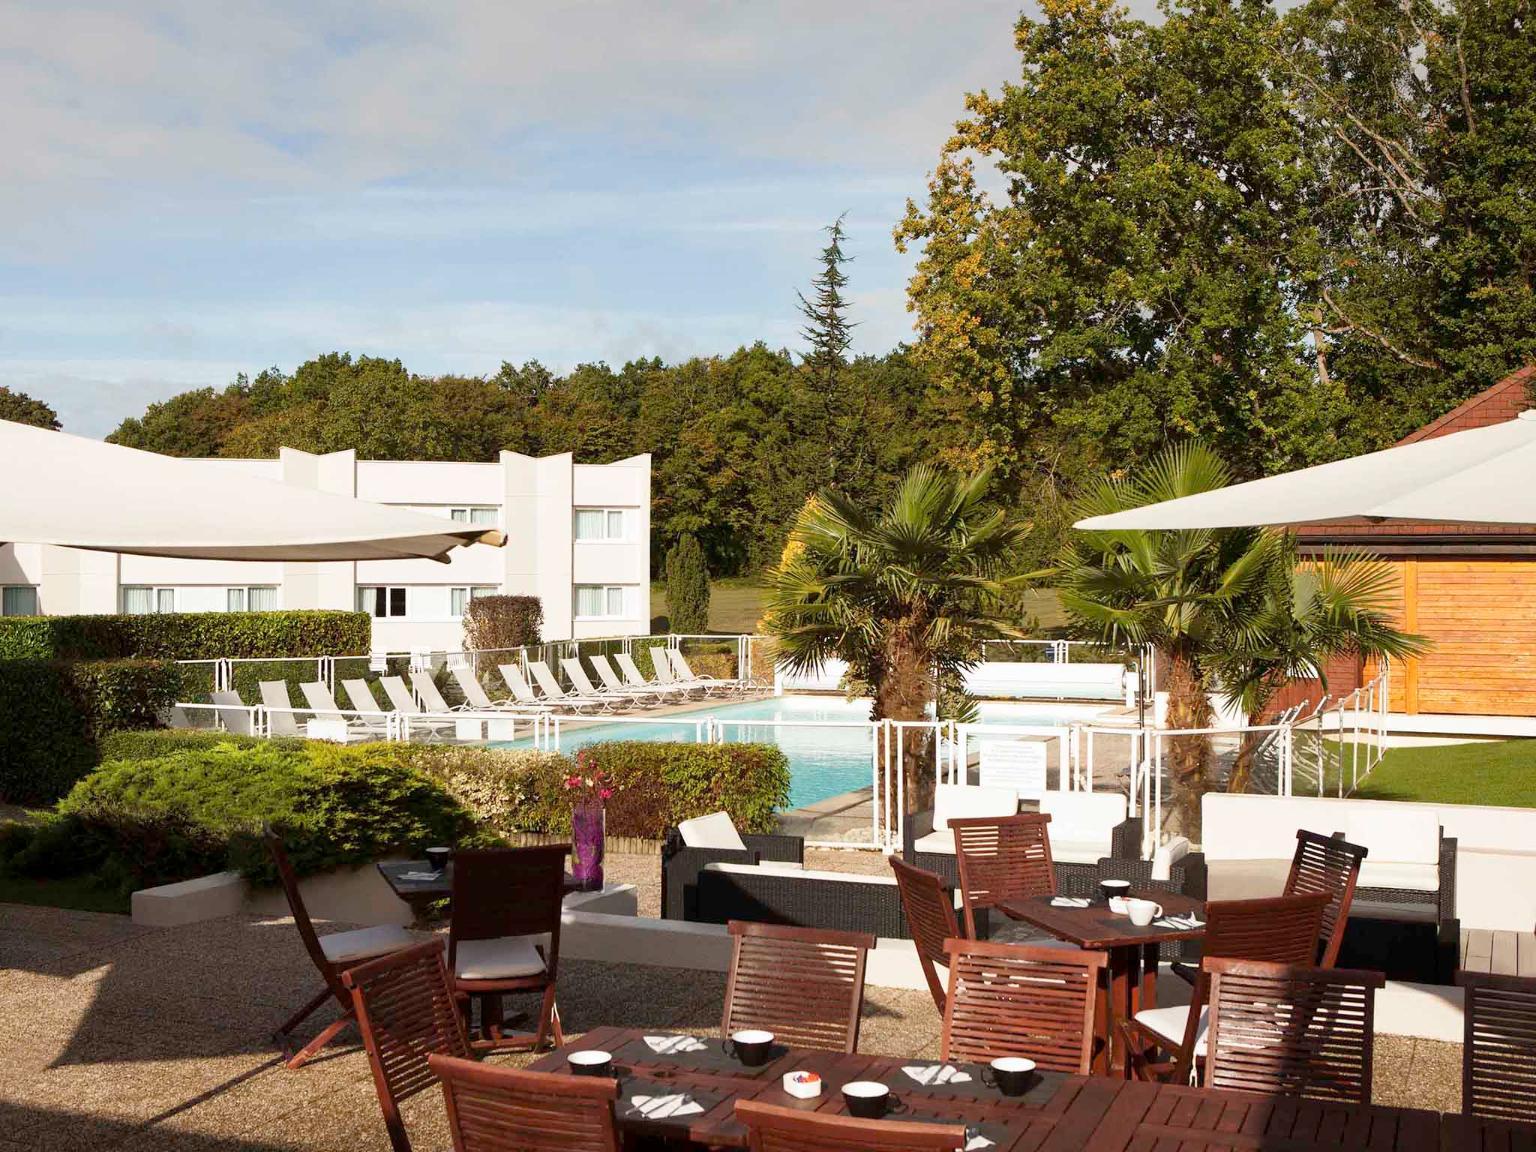 Novotel fontainebleau ury h tel route nationale 152 - Hotel fontainebleau piscine ...